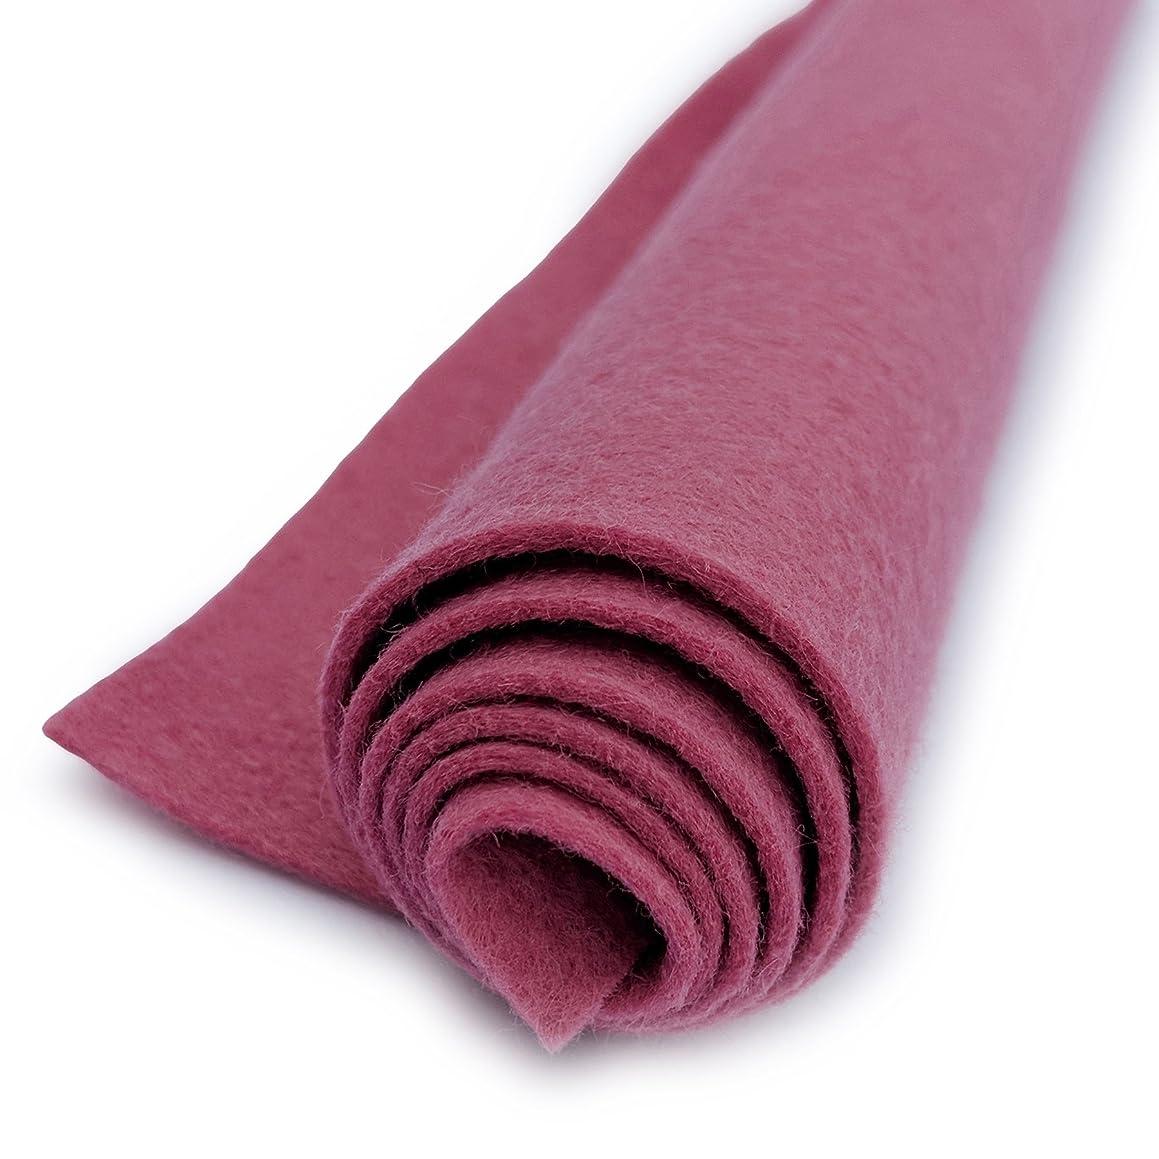 English Rose Pink - Wool Felt Oversized Sheet - 35% Wool Blend - 1 12x18 inch sheet